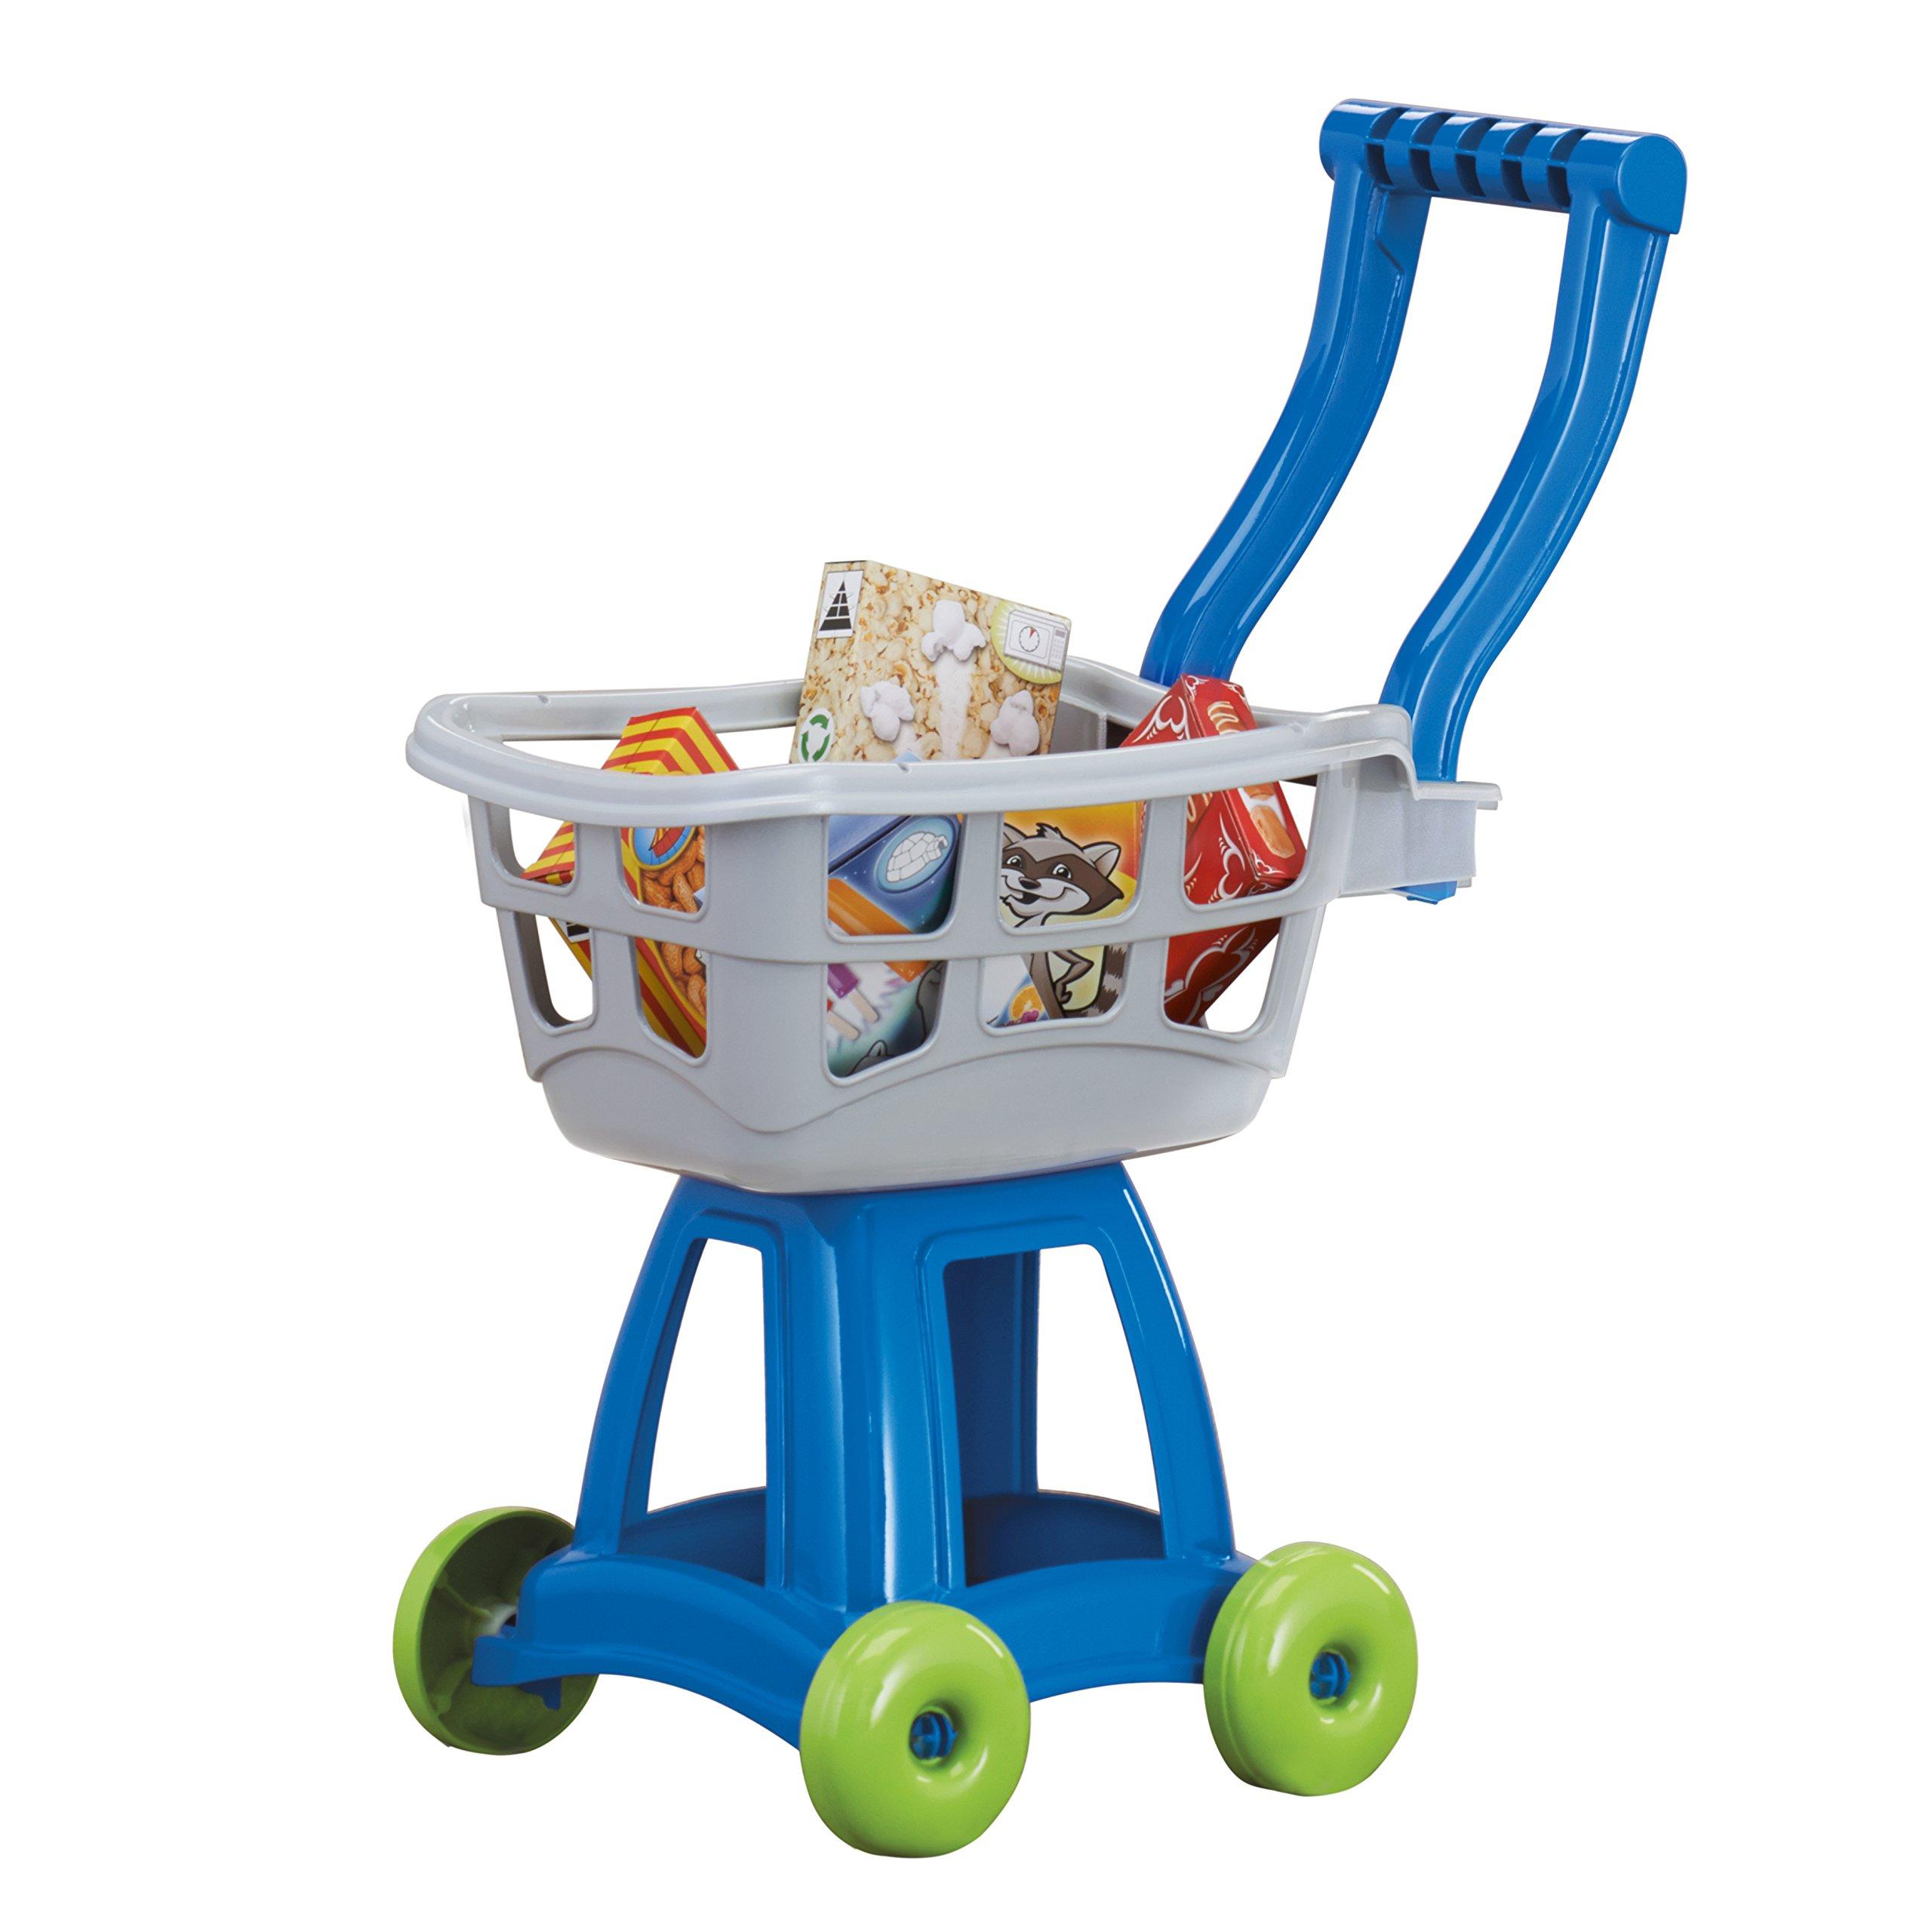 American Plastic Toys Kids Shopping Cart Set, Gray by American Plastic Toys